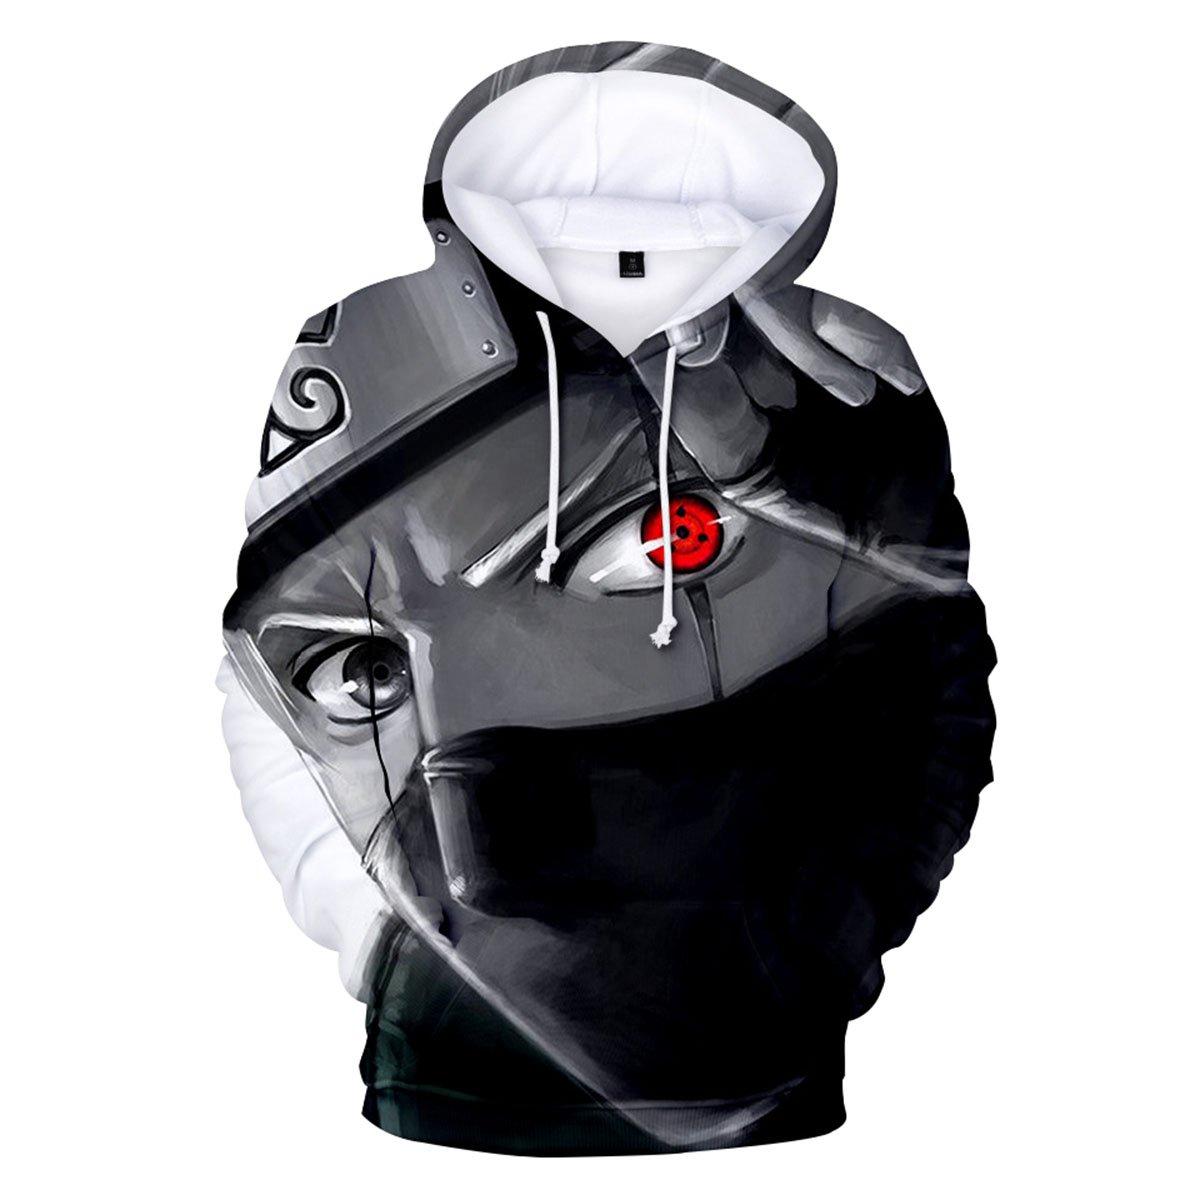 CTOOO 2018 Sweats à Capuche Naruto 3D Anime Homme Unisex Mode XXS-3XL